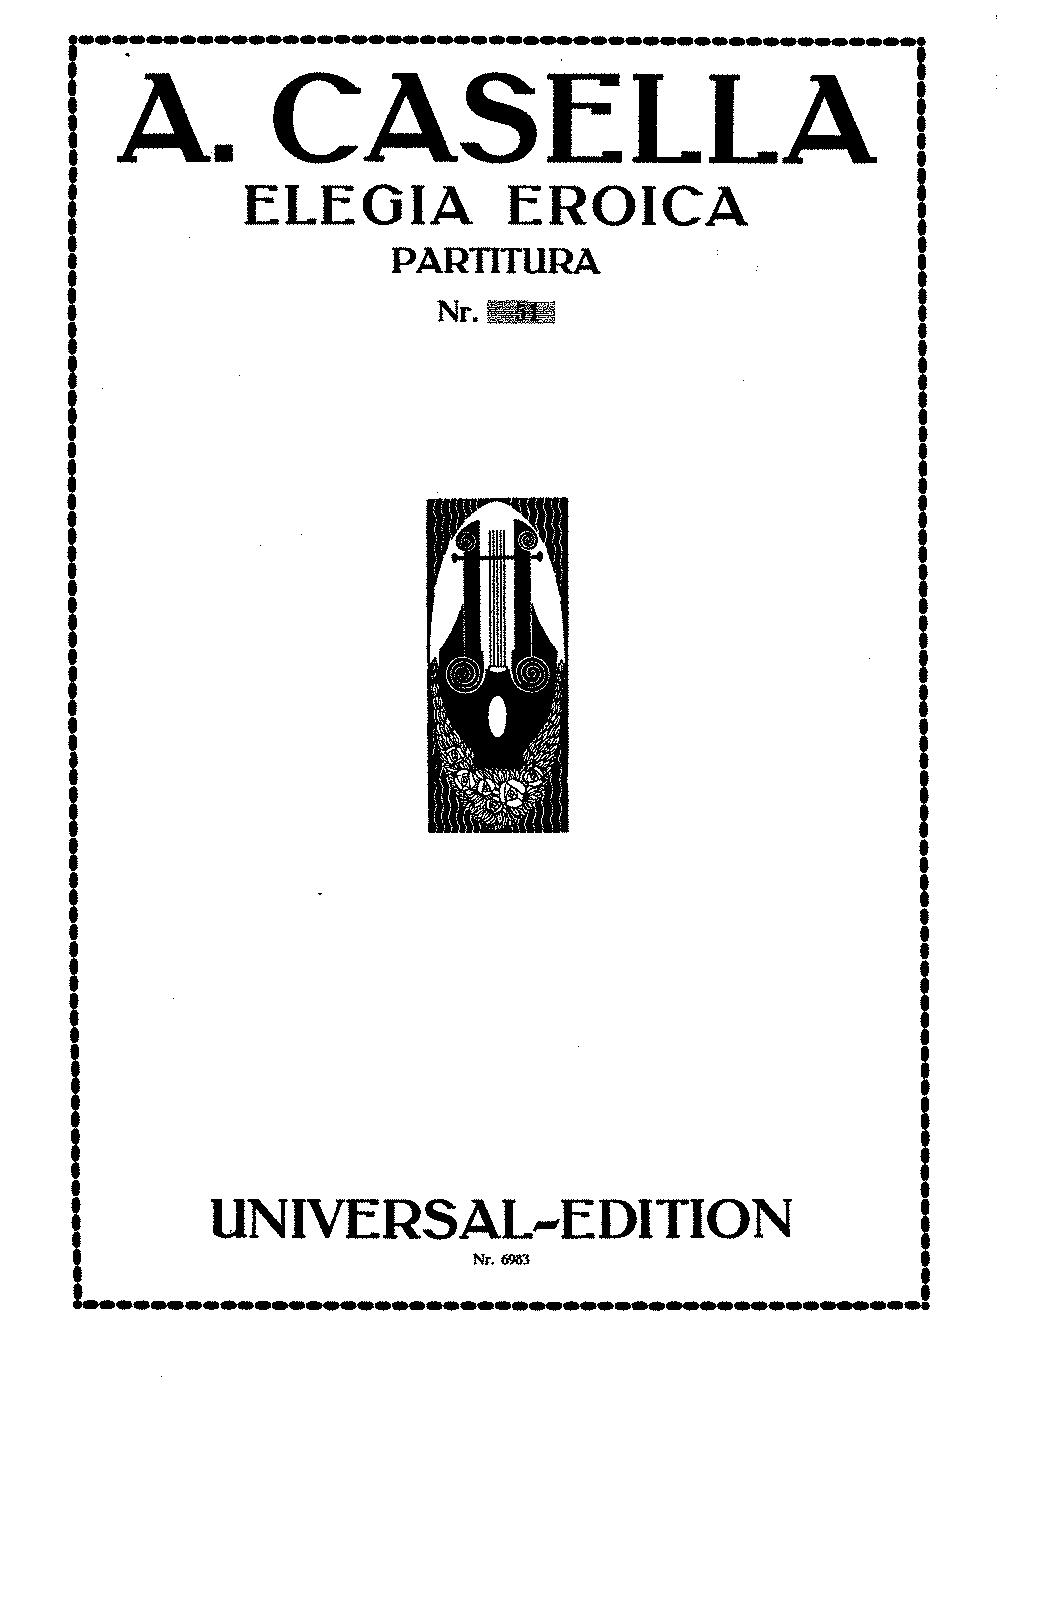 Elegia eroica, Op.29 (Casella, Alfredo) - IMSLP/Petrucci ...